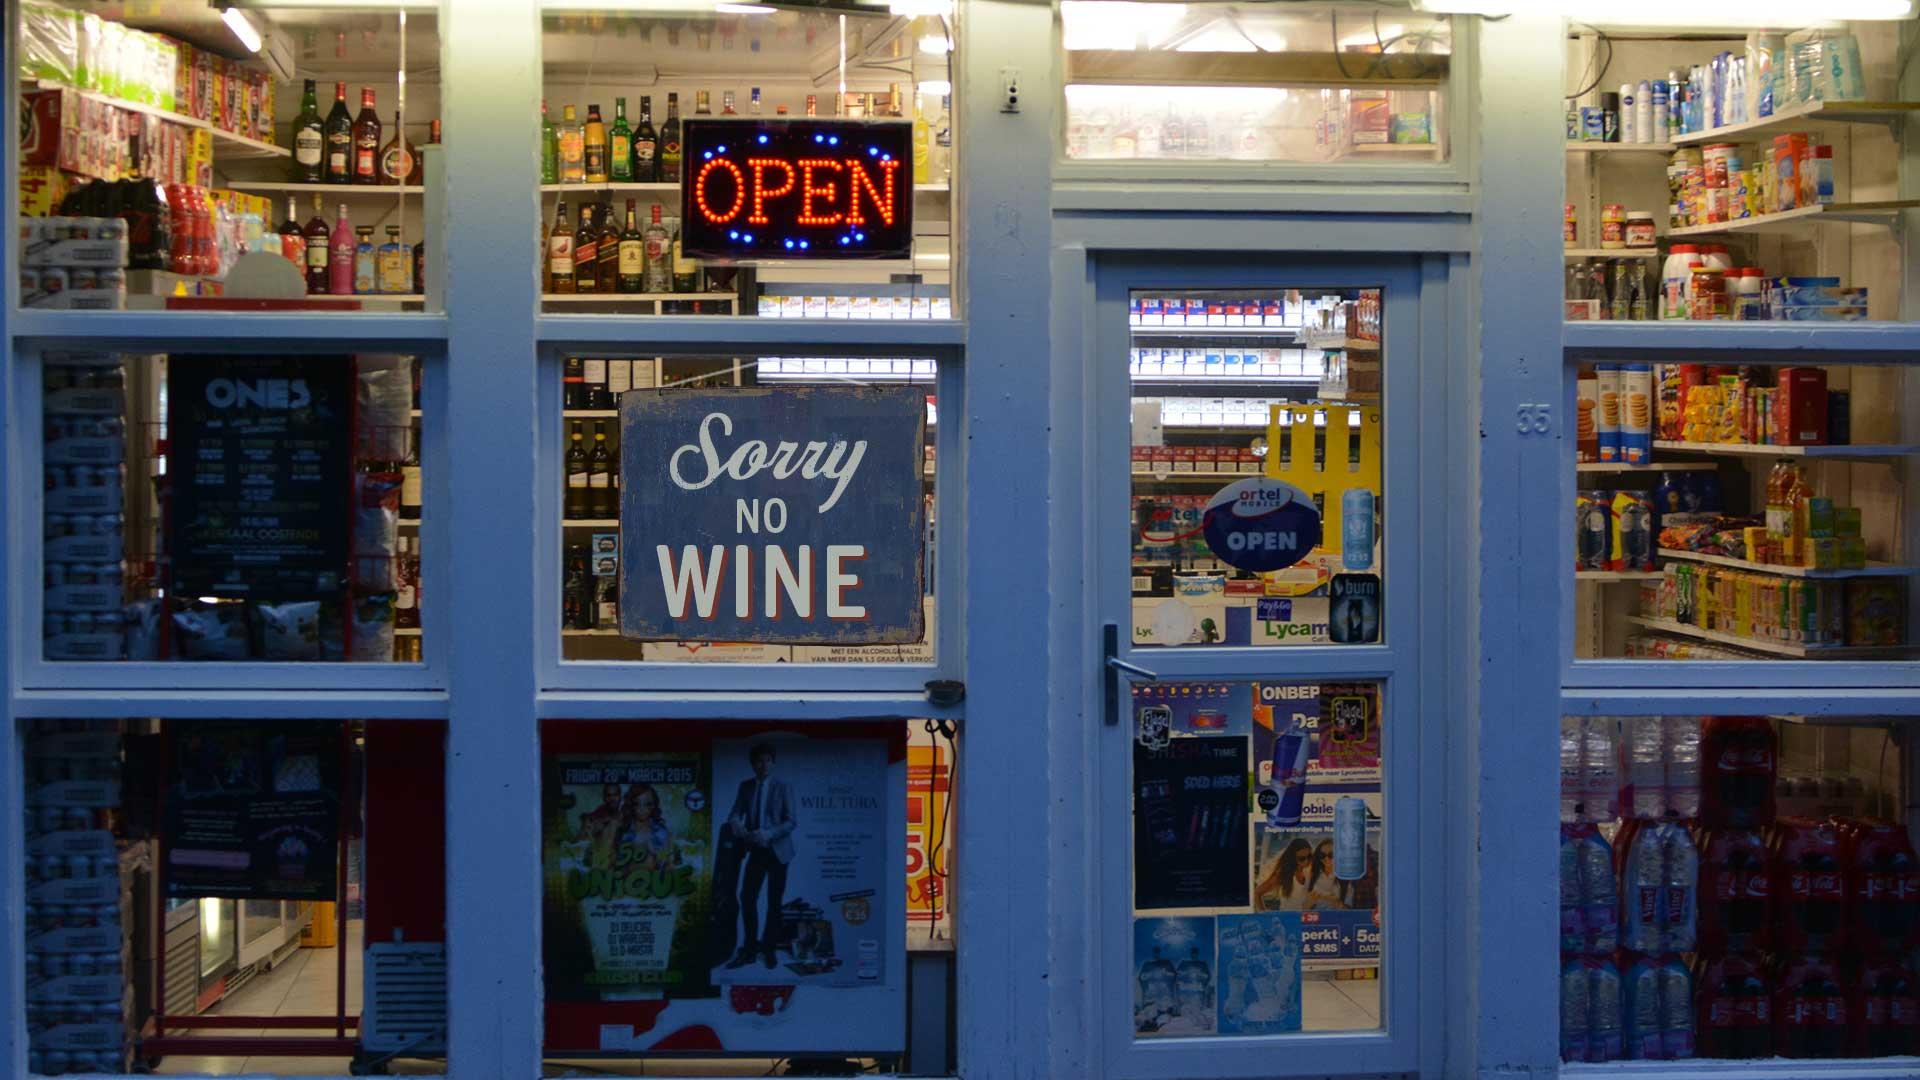 Liquor-Stores-Run-Out-of-Wine-as-Minnesota-Teachers-Prepare-for-School-Year.jpg